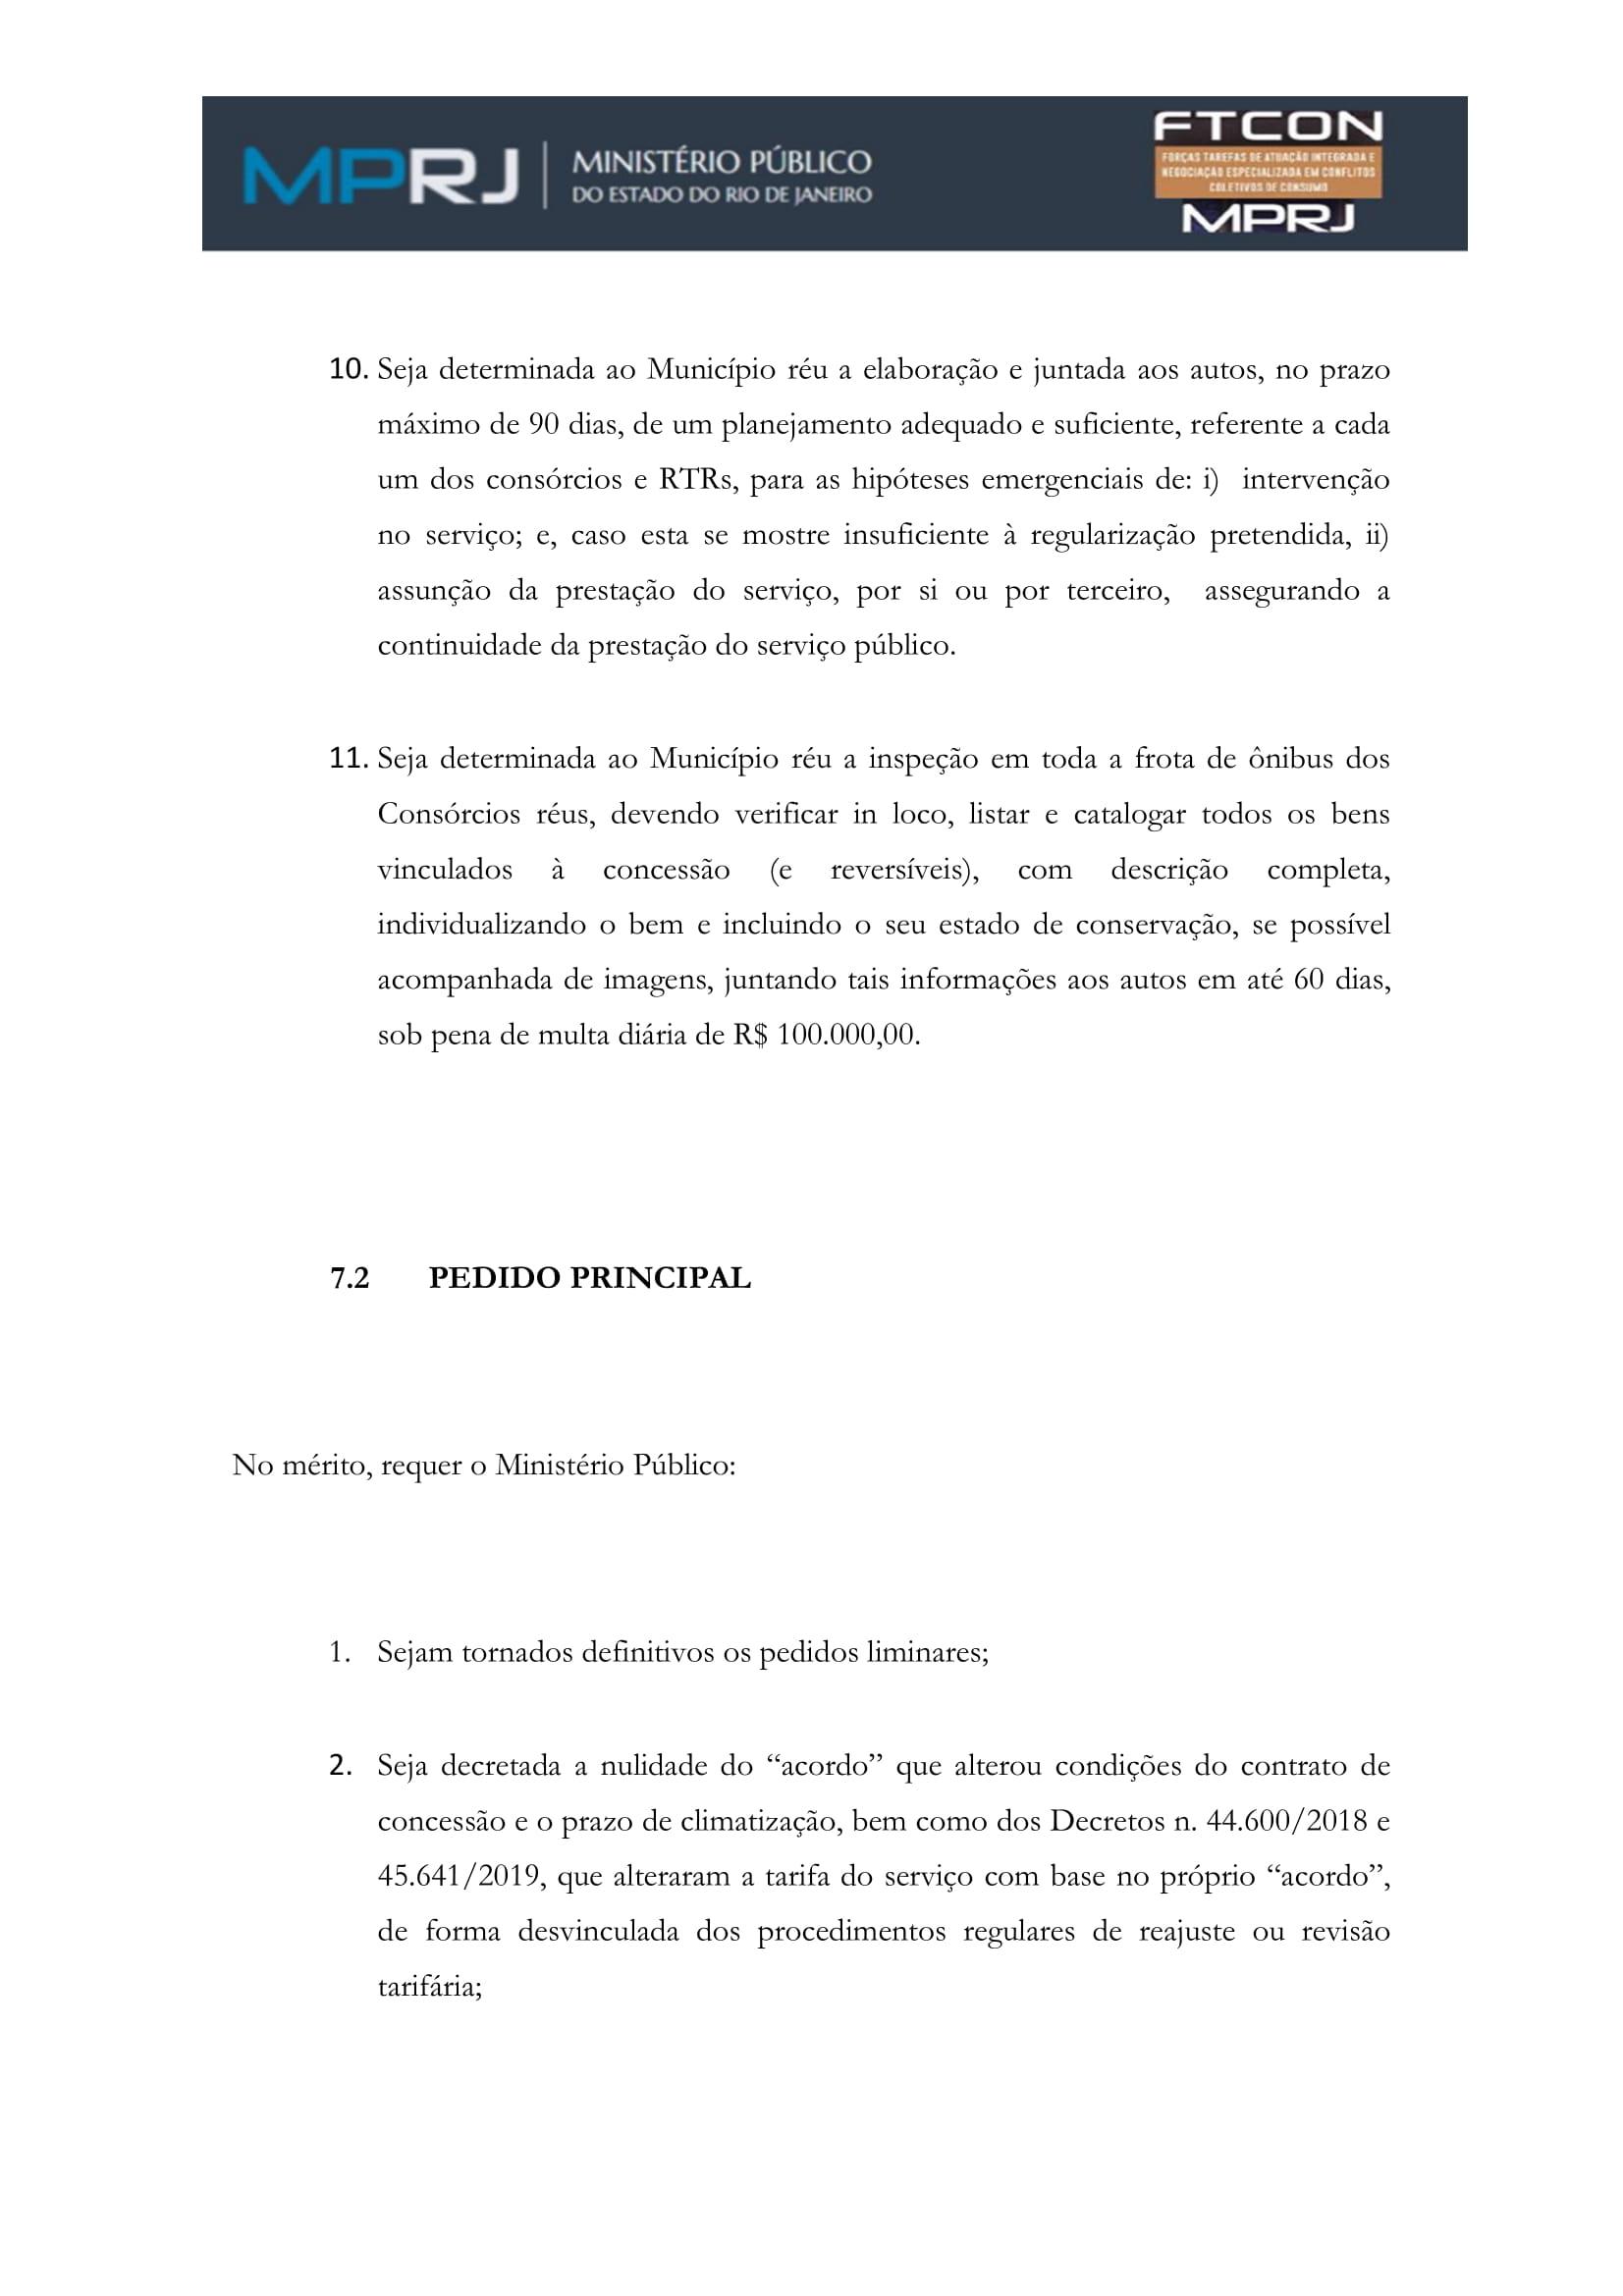 acp_caducidade_onibus_dr_rt-136